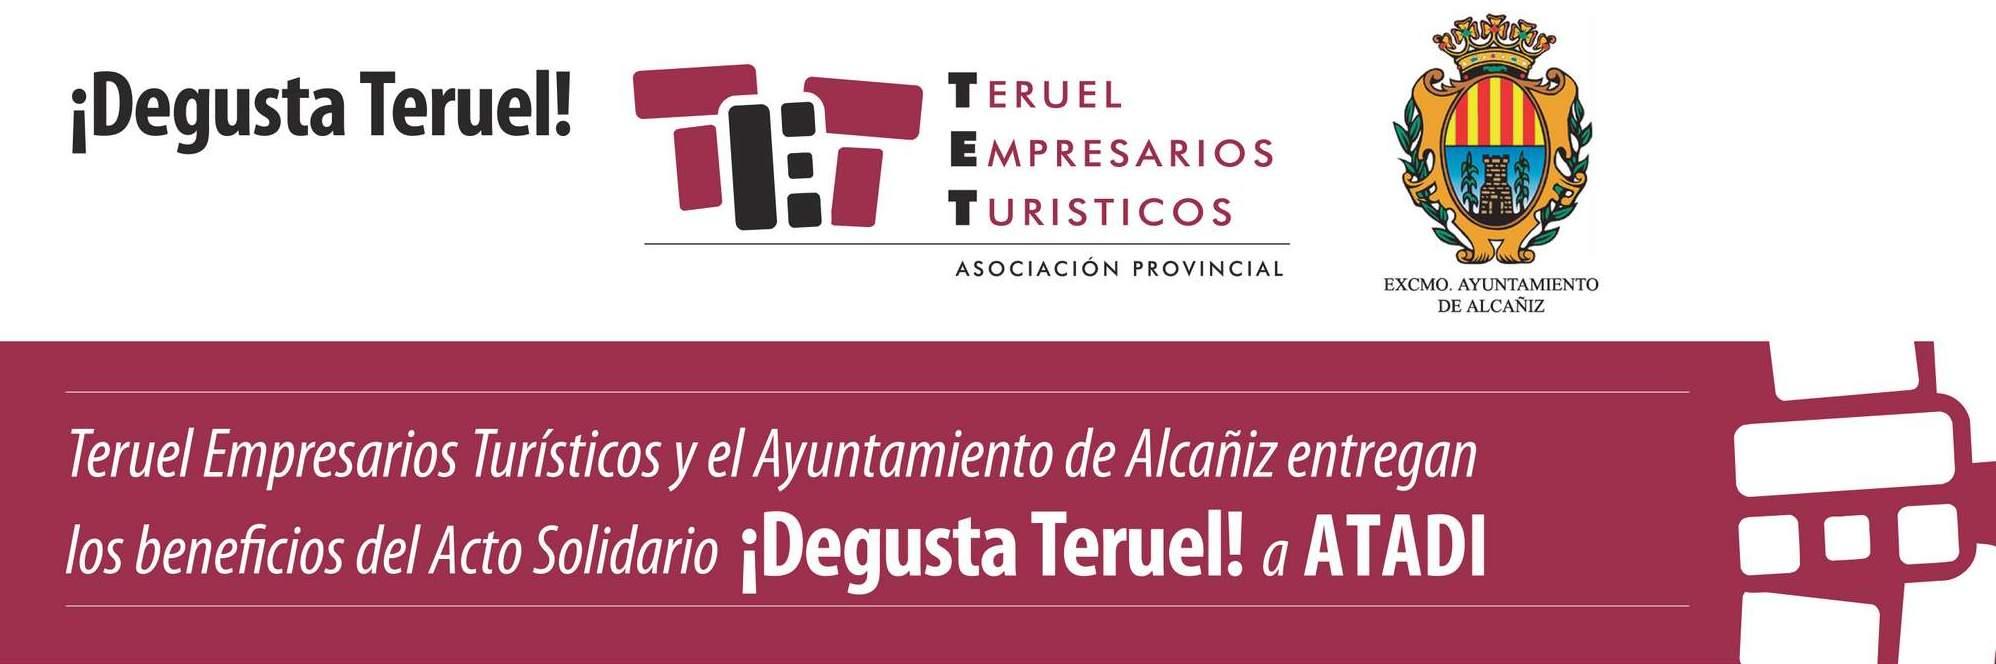 La TET dona 2.728 € a ATADI del evento DEGUSTA TERUEL 2018